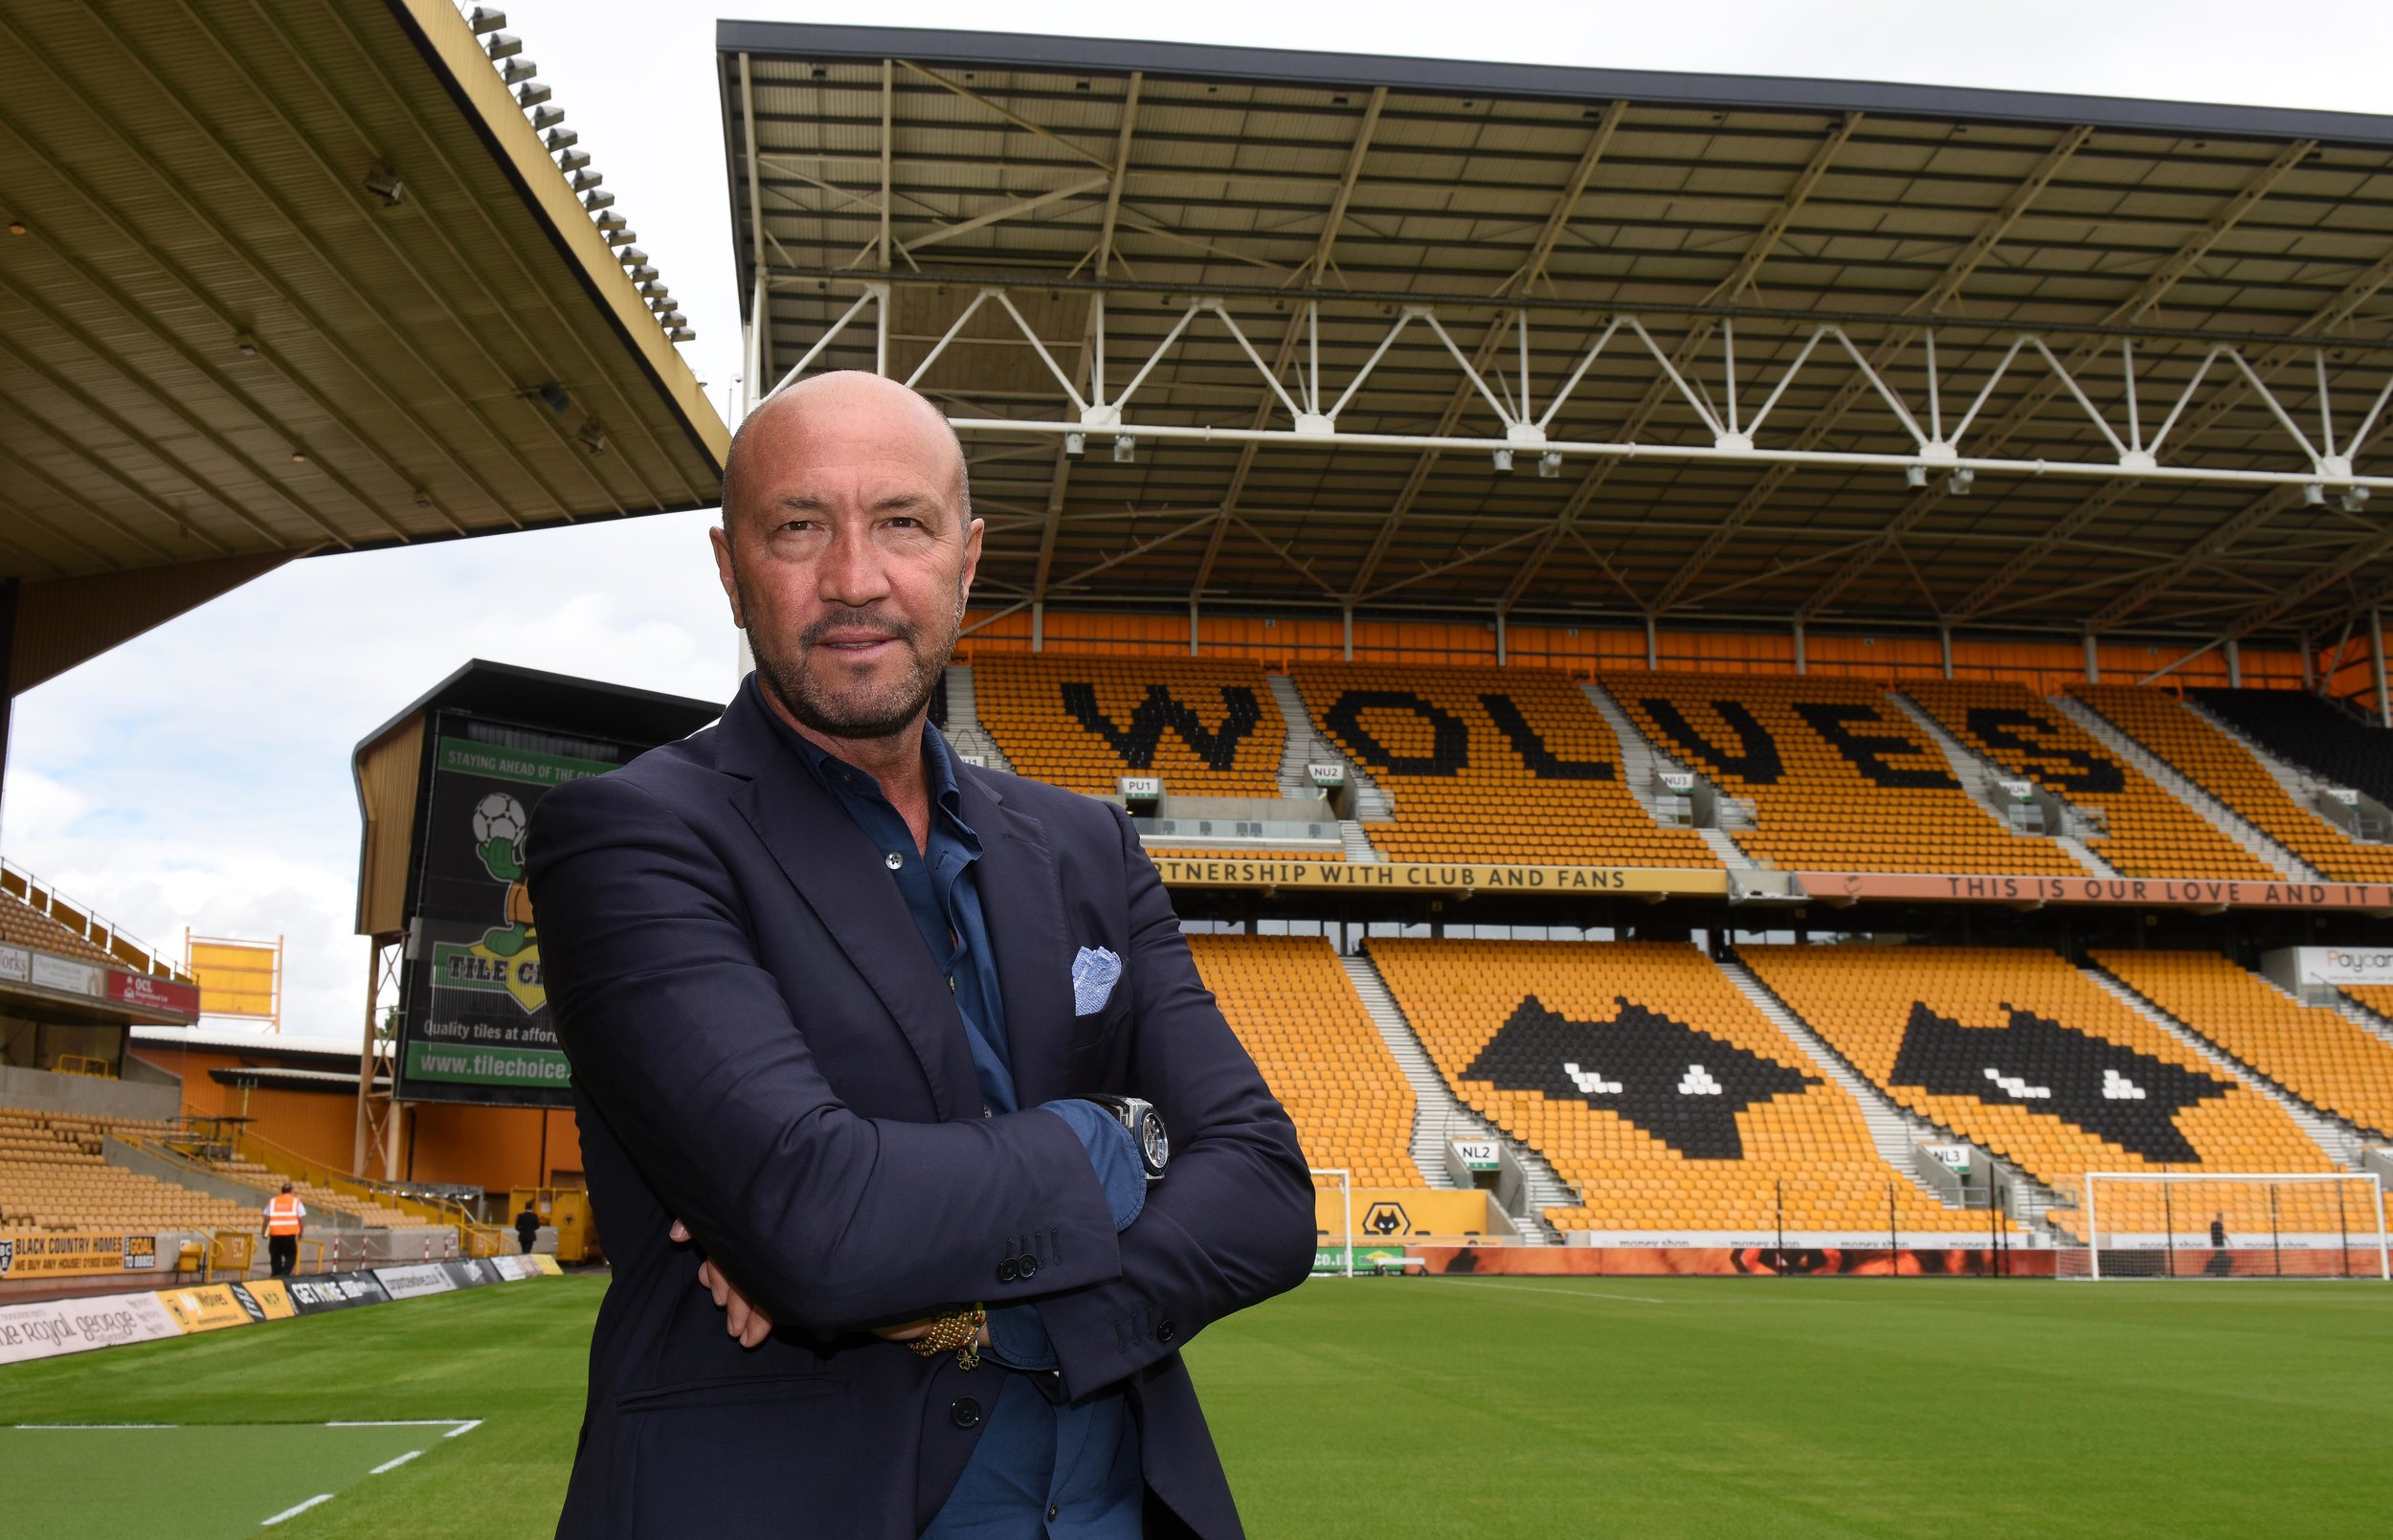 Walter Zenga under præsentationen som ny manager i Wolverhampton. Foto: Getty Images/Sam Bagnall.